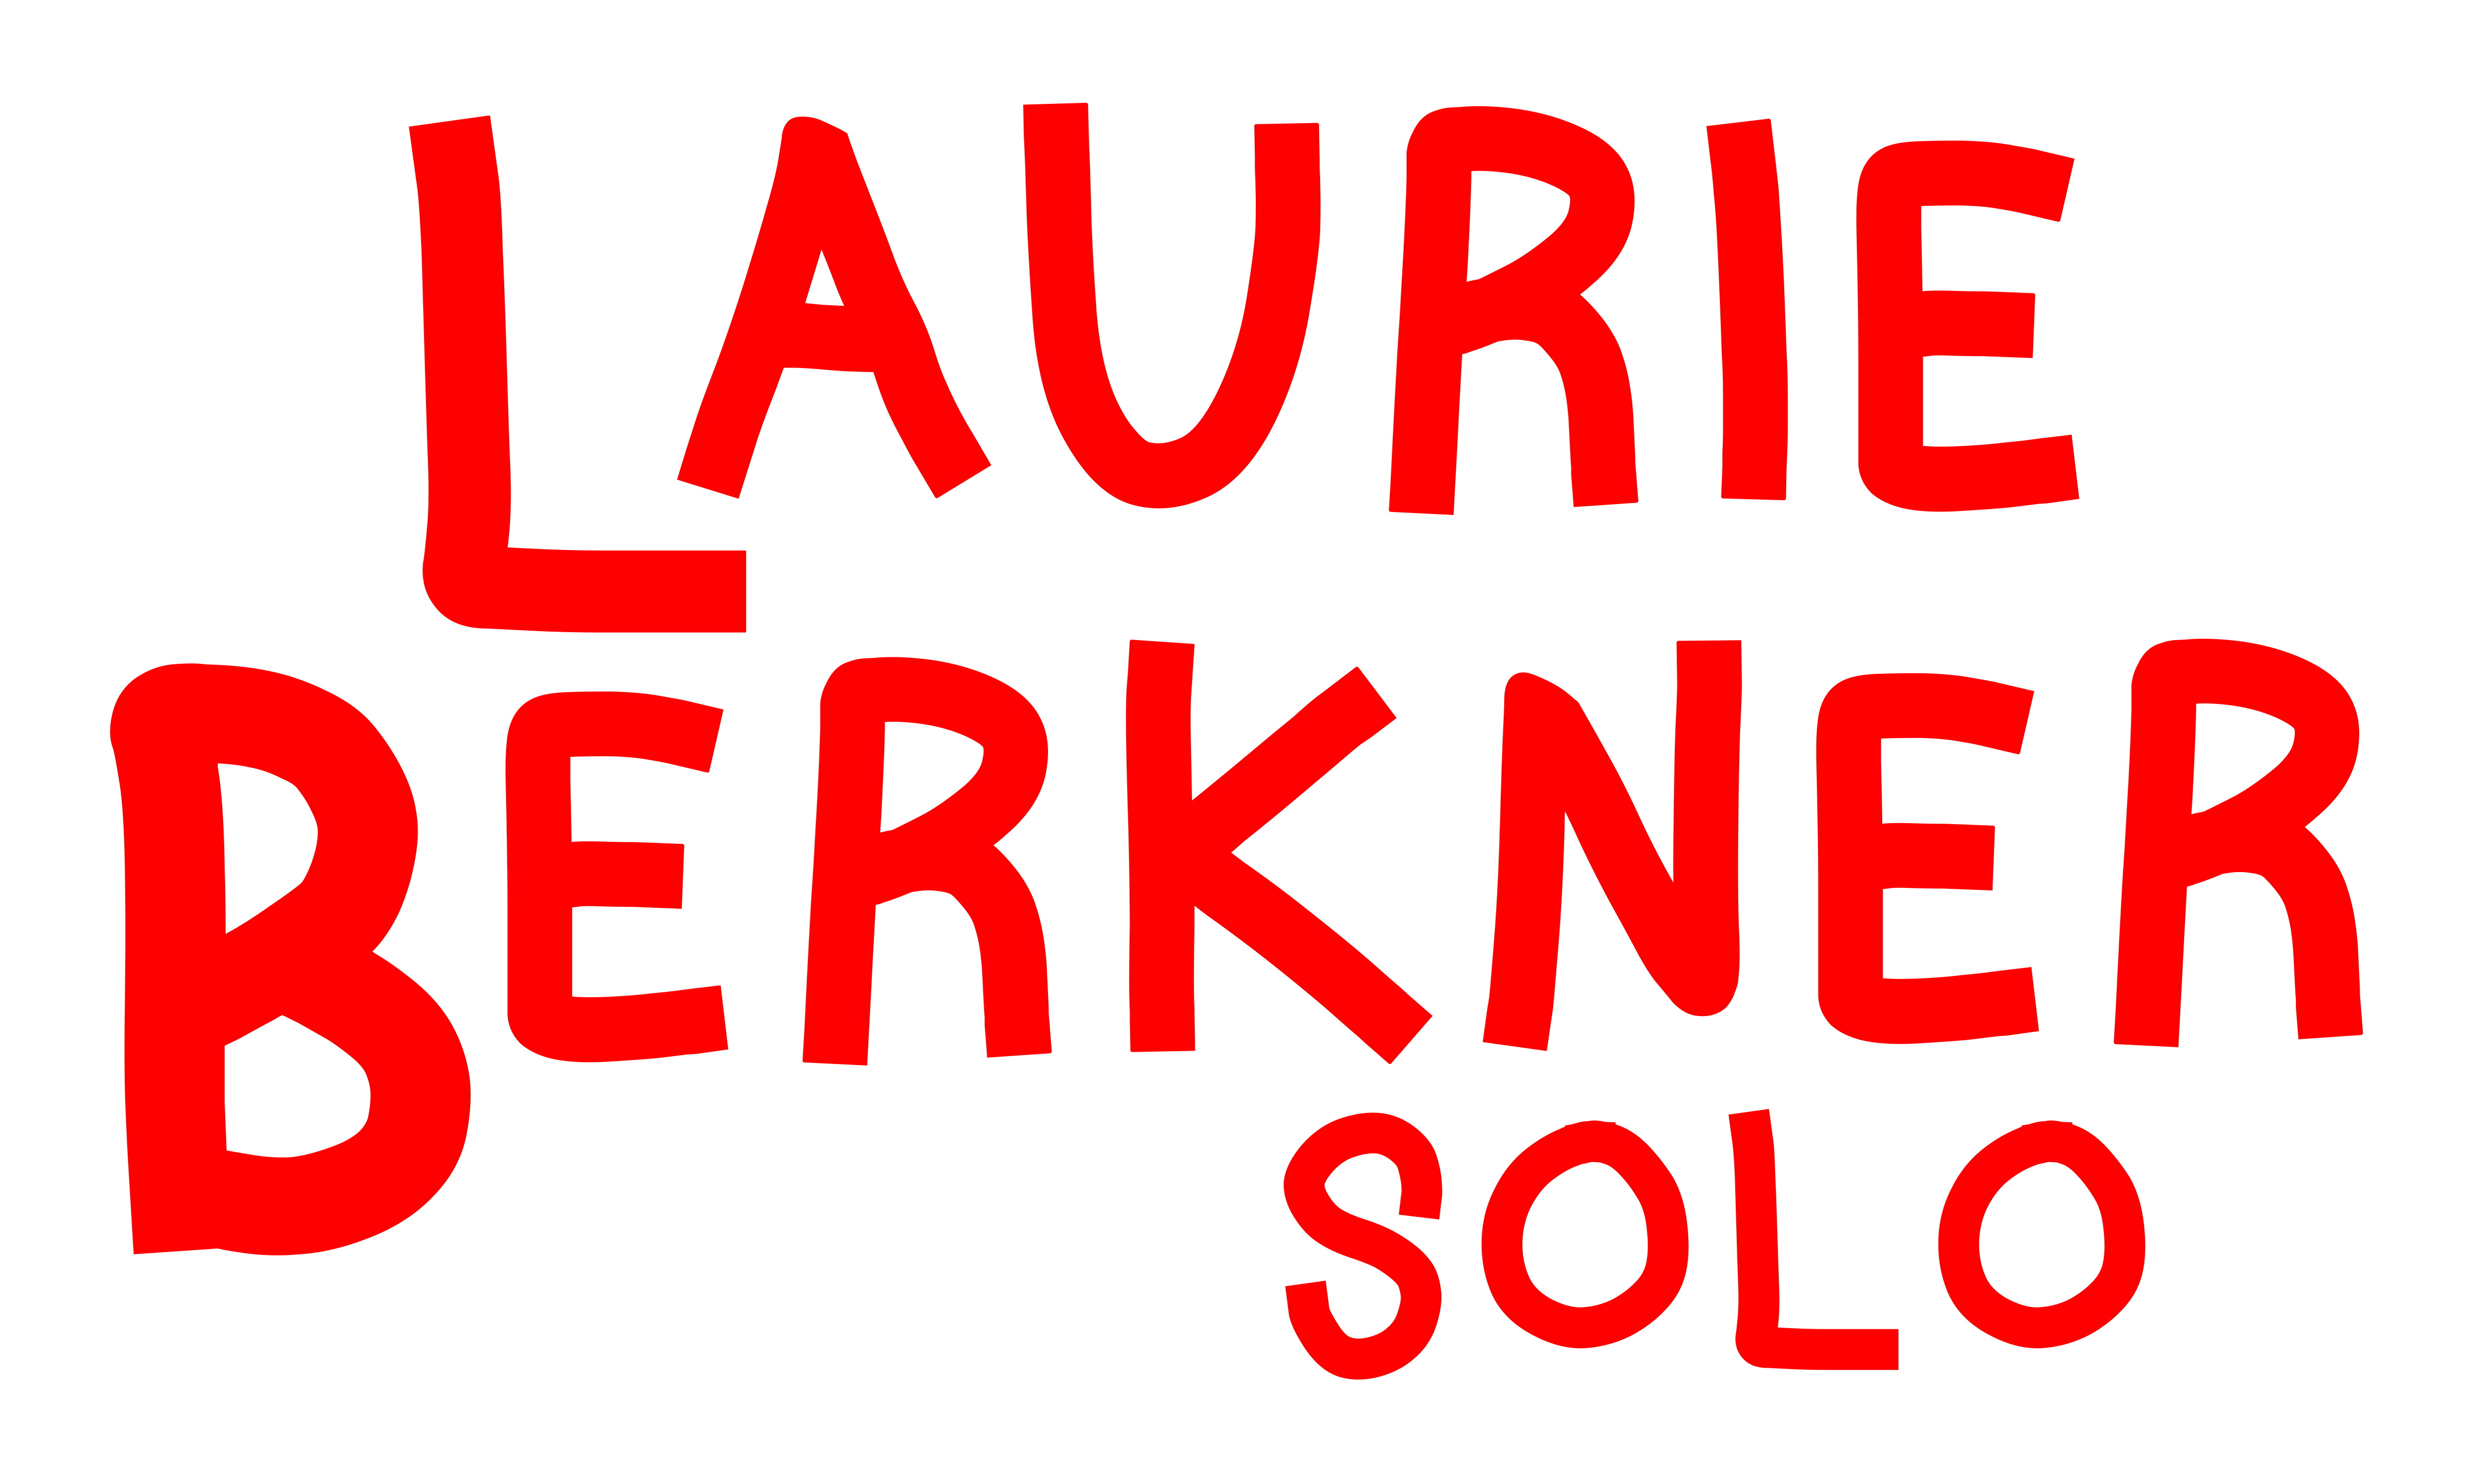 Laurie Berkner Logo solo | Educational Alliance